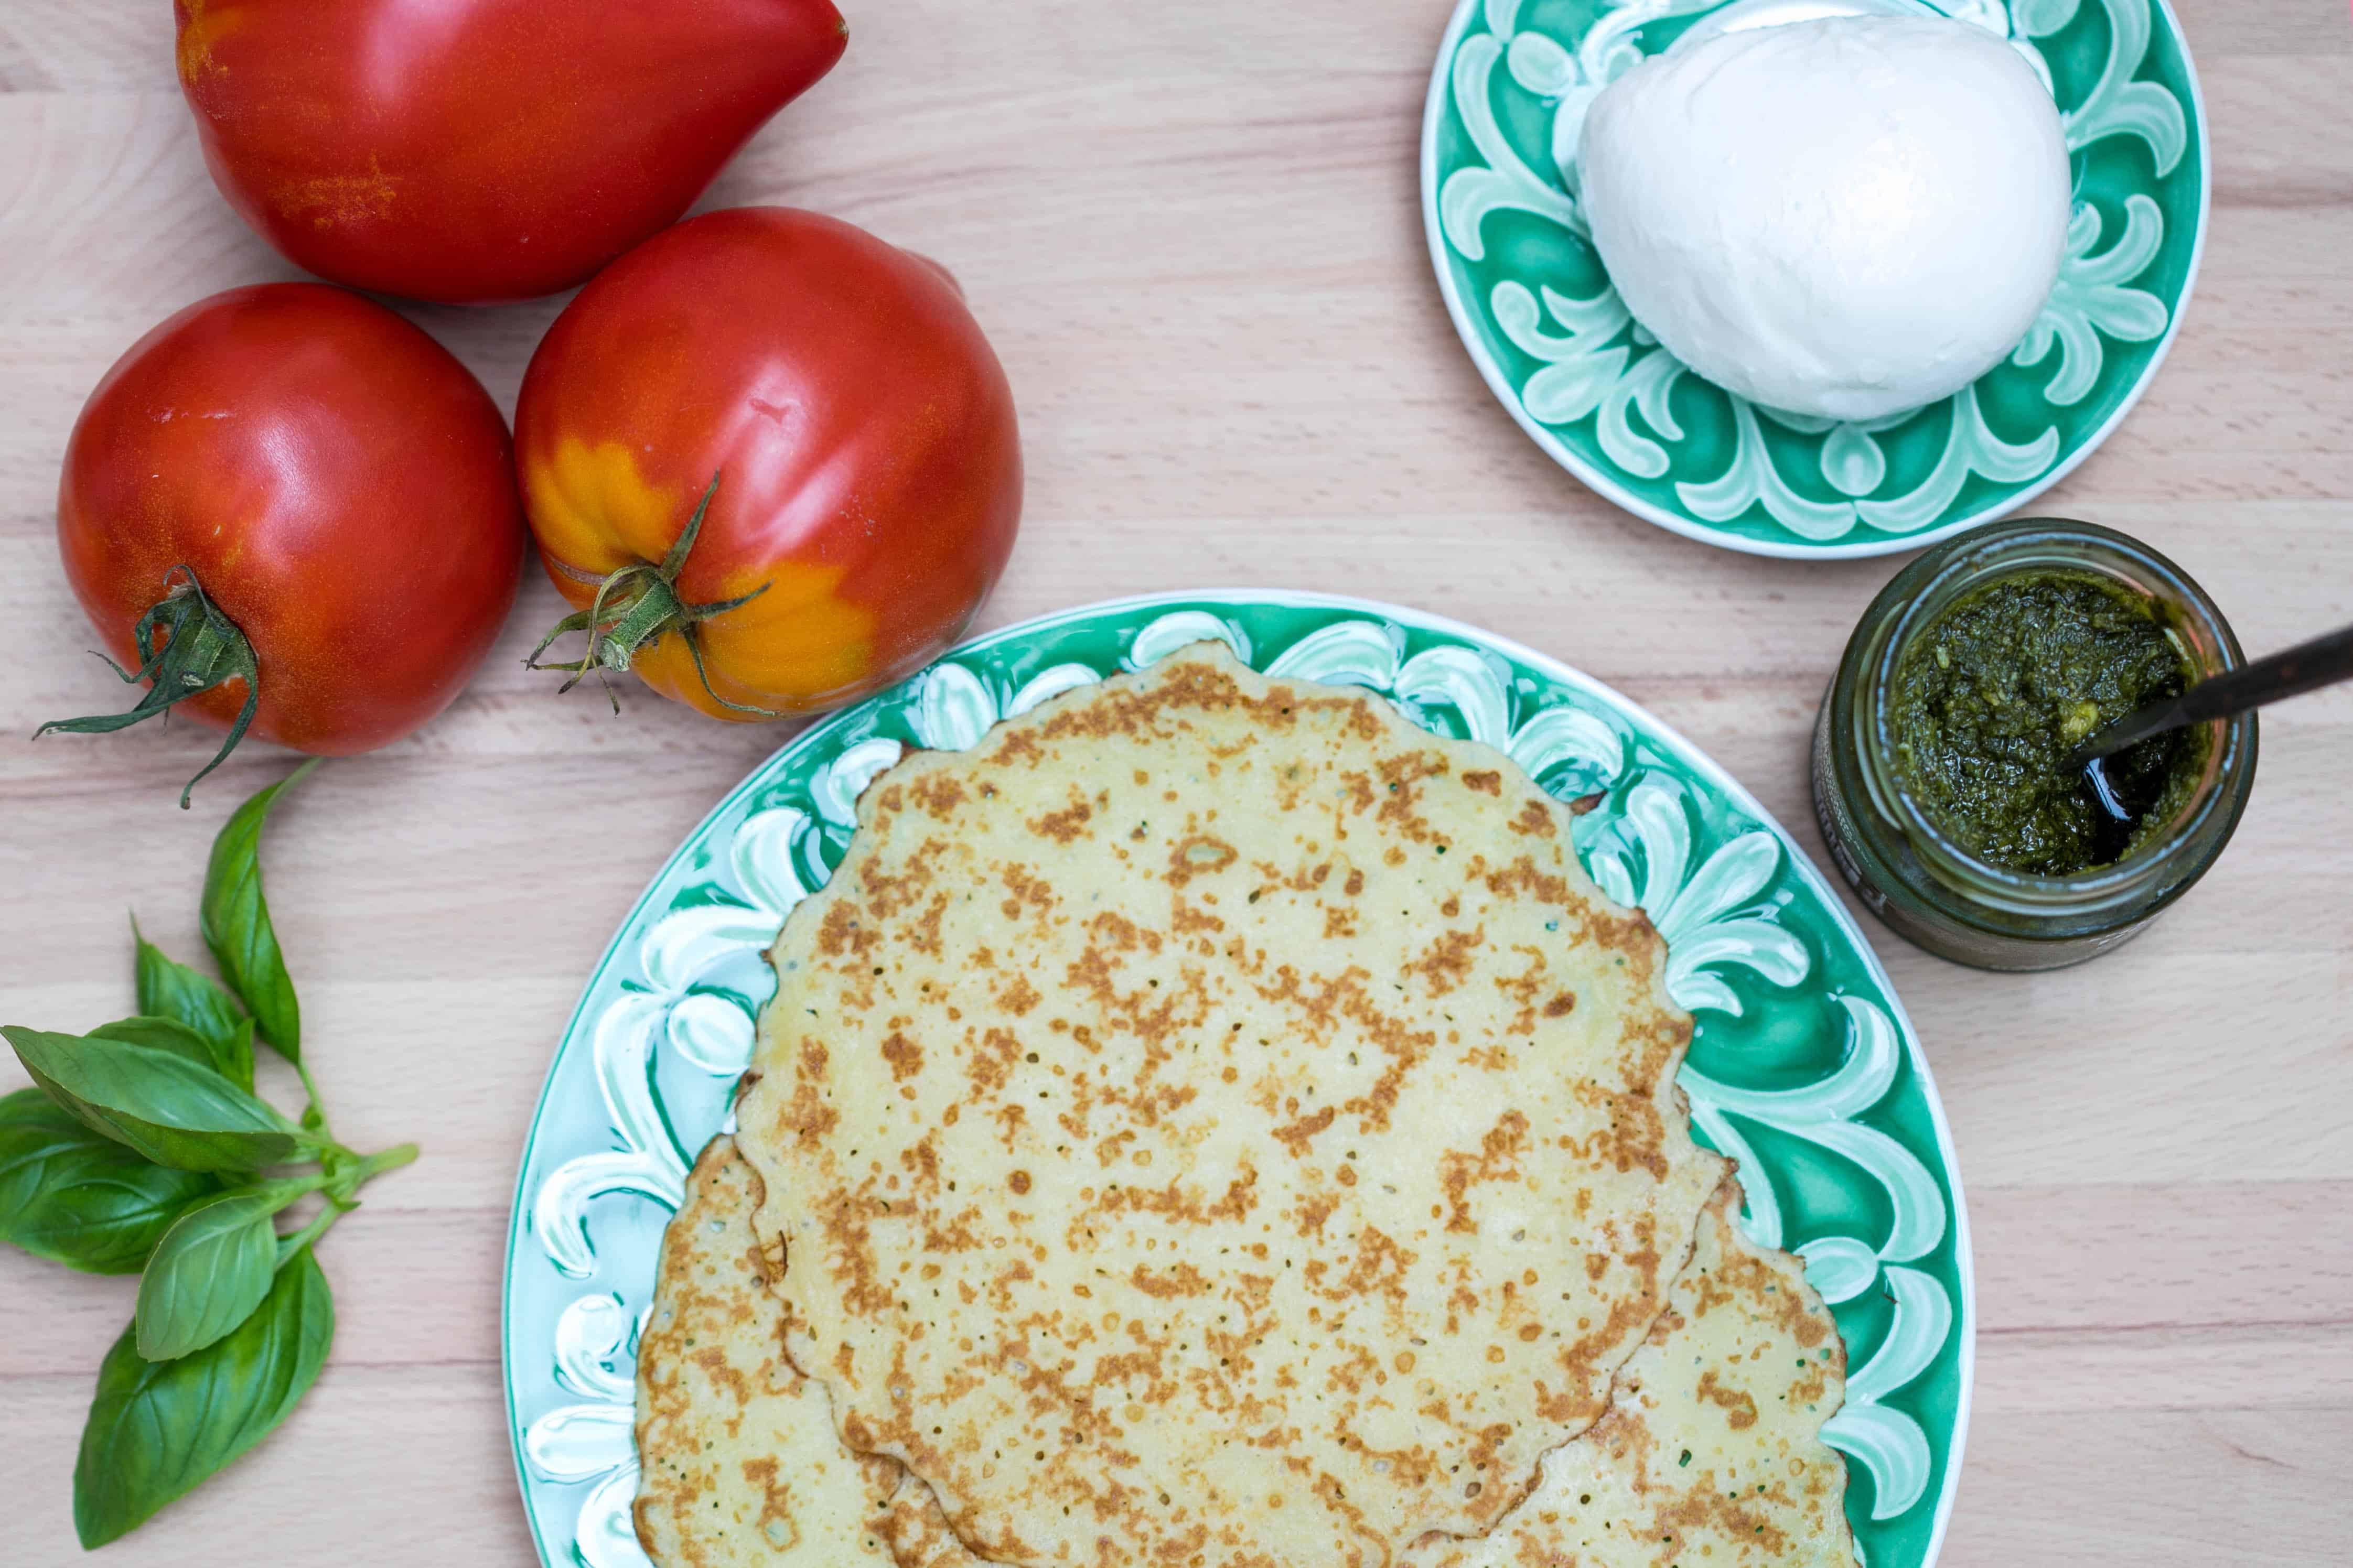 tomatoes, basil, crepes, mozzarella cheese, and pesto